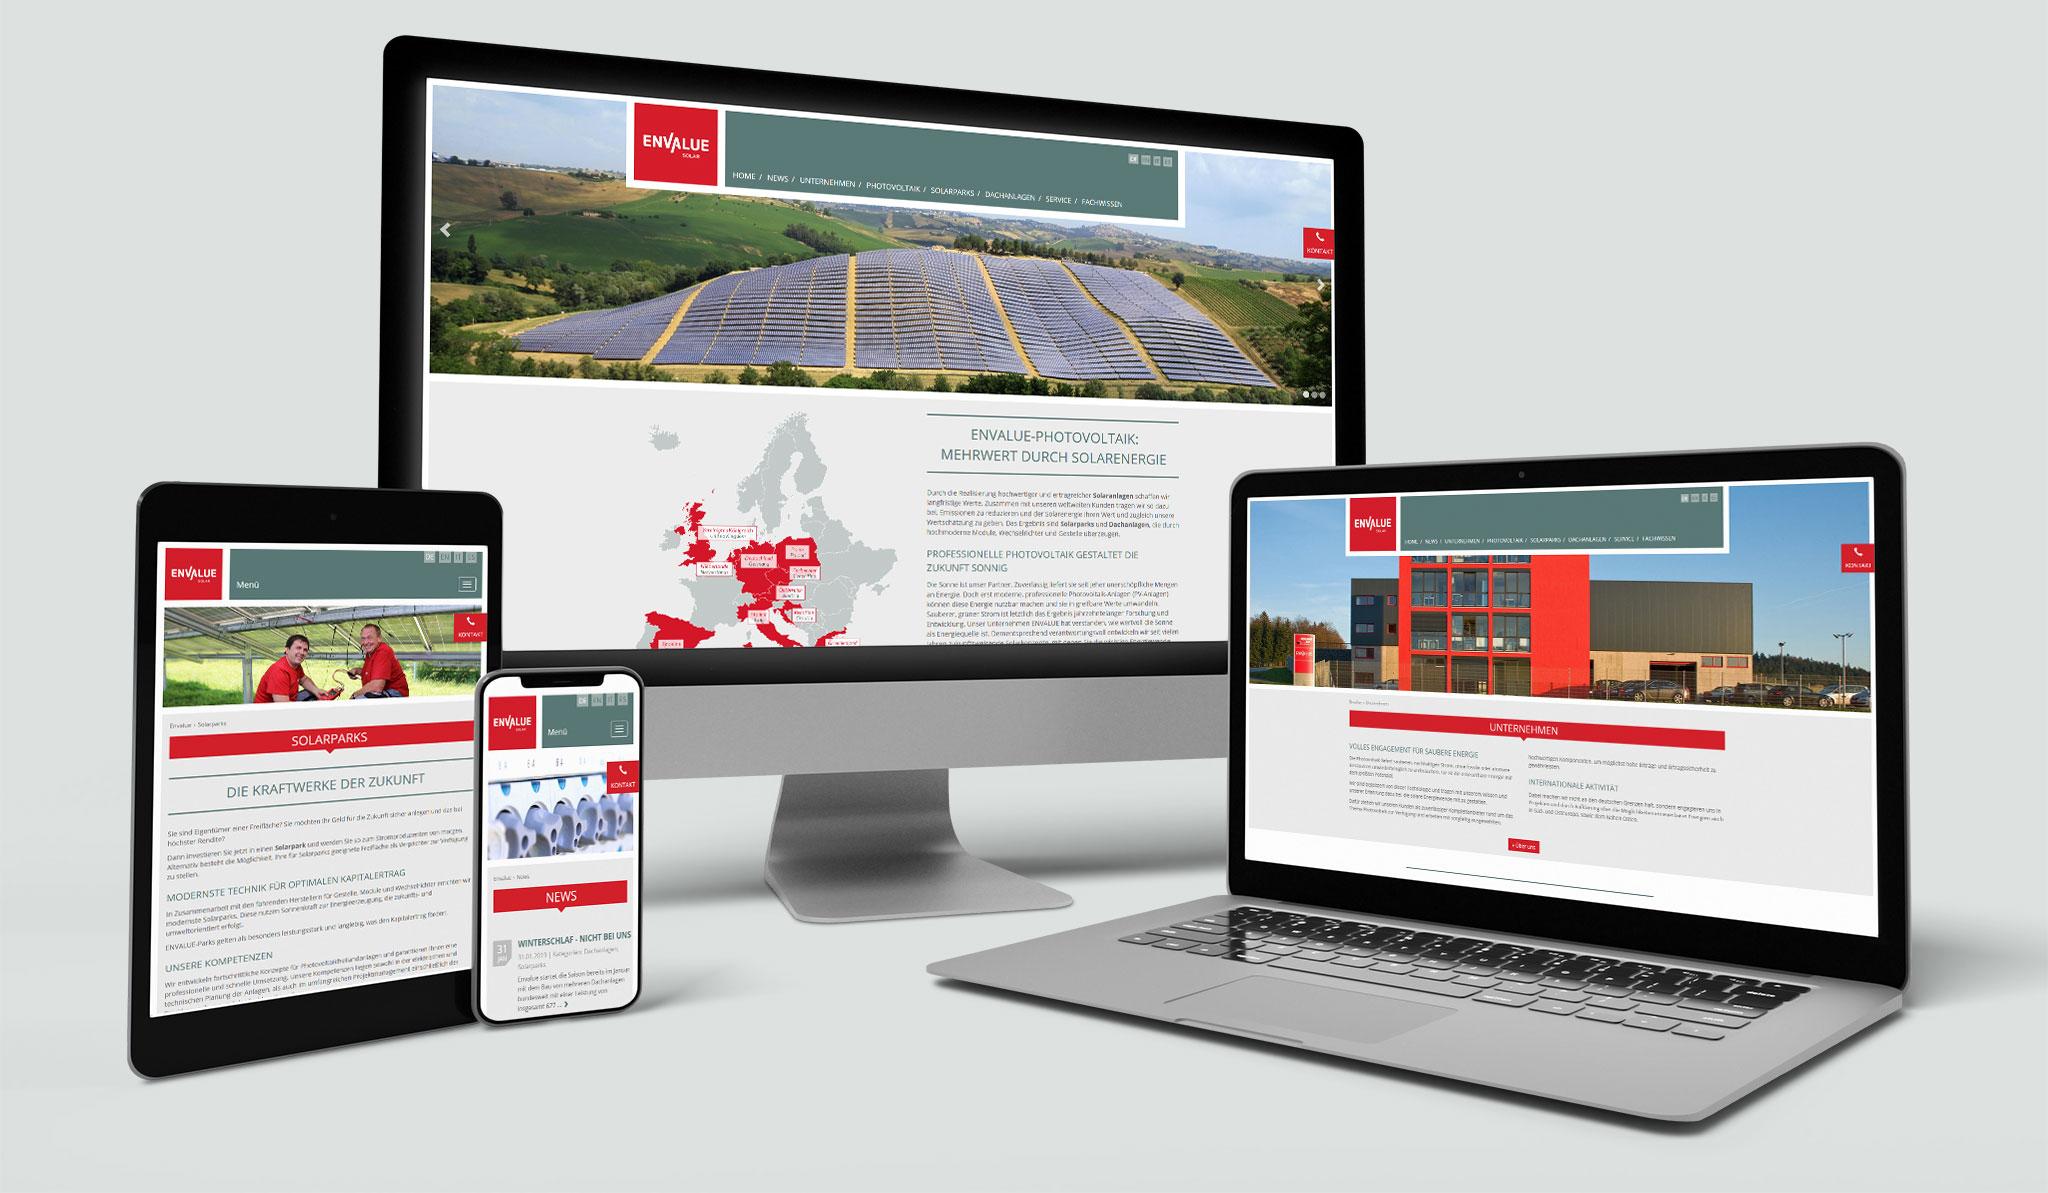 Envalue Website | Werbeagentur Roland C. Ritter